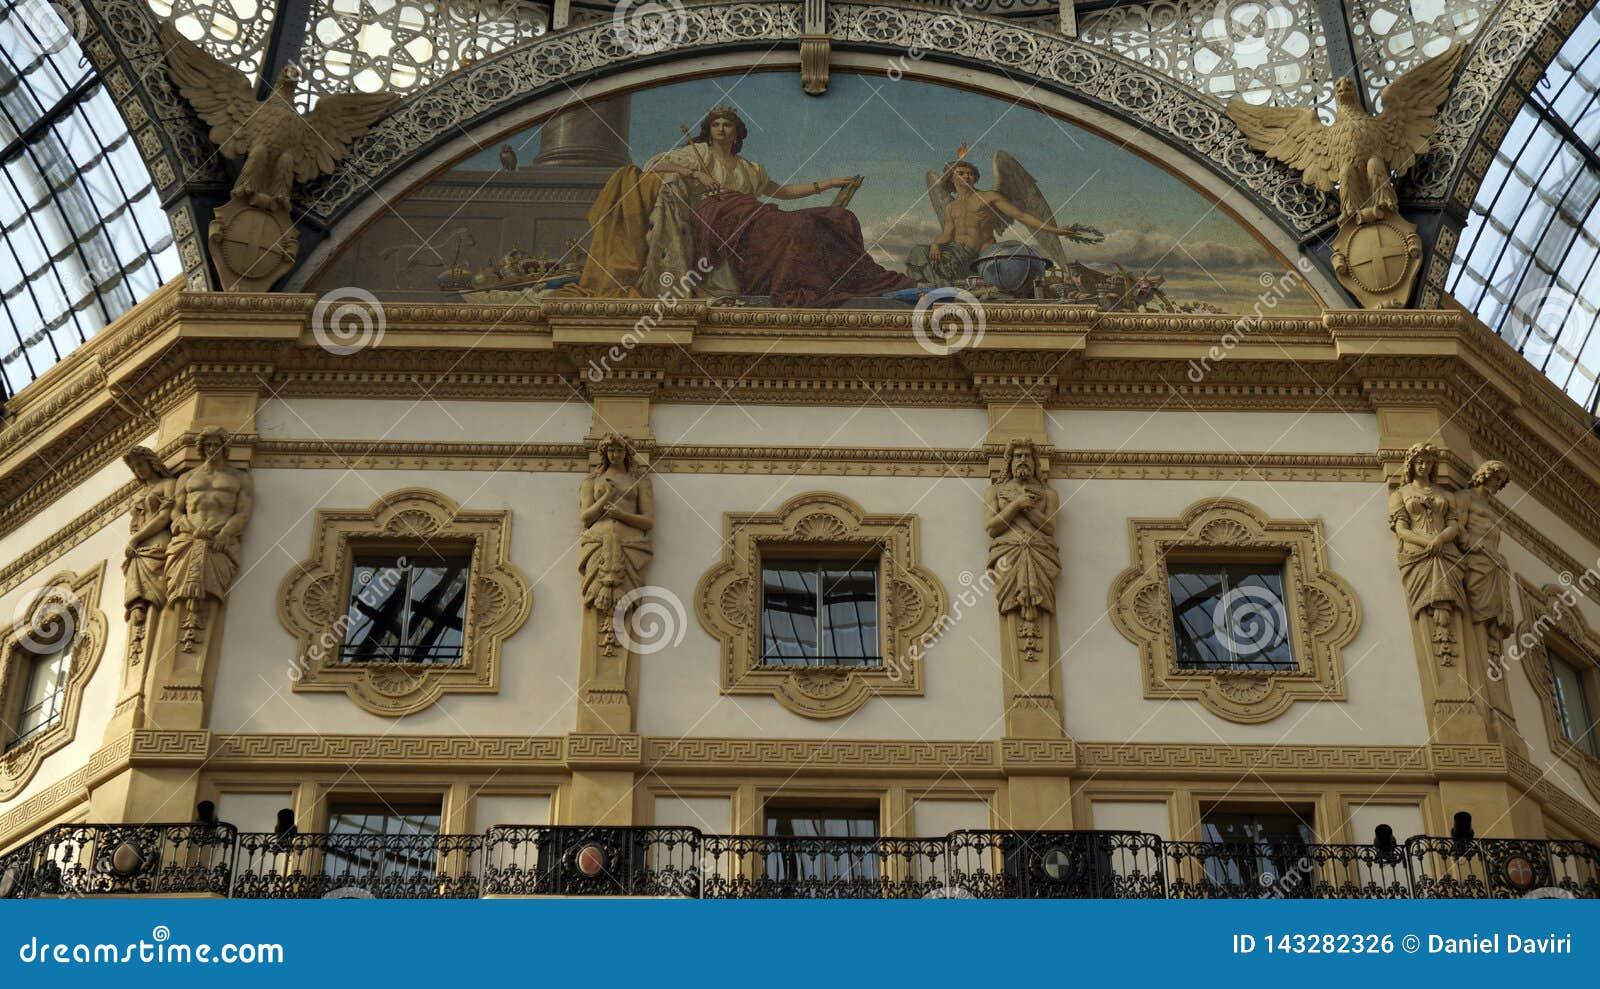 Gallery Vittorio Emanuele II, art details. Milan.Italy